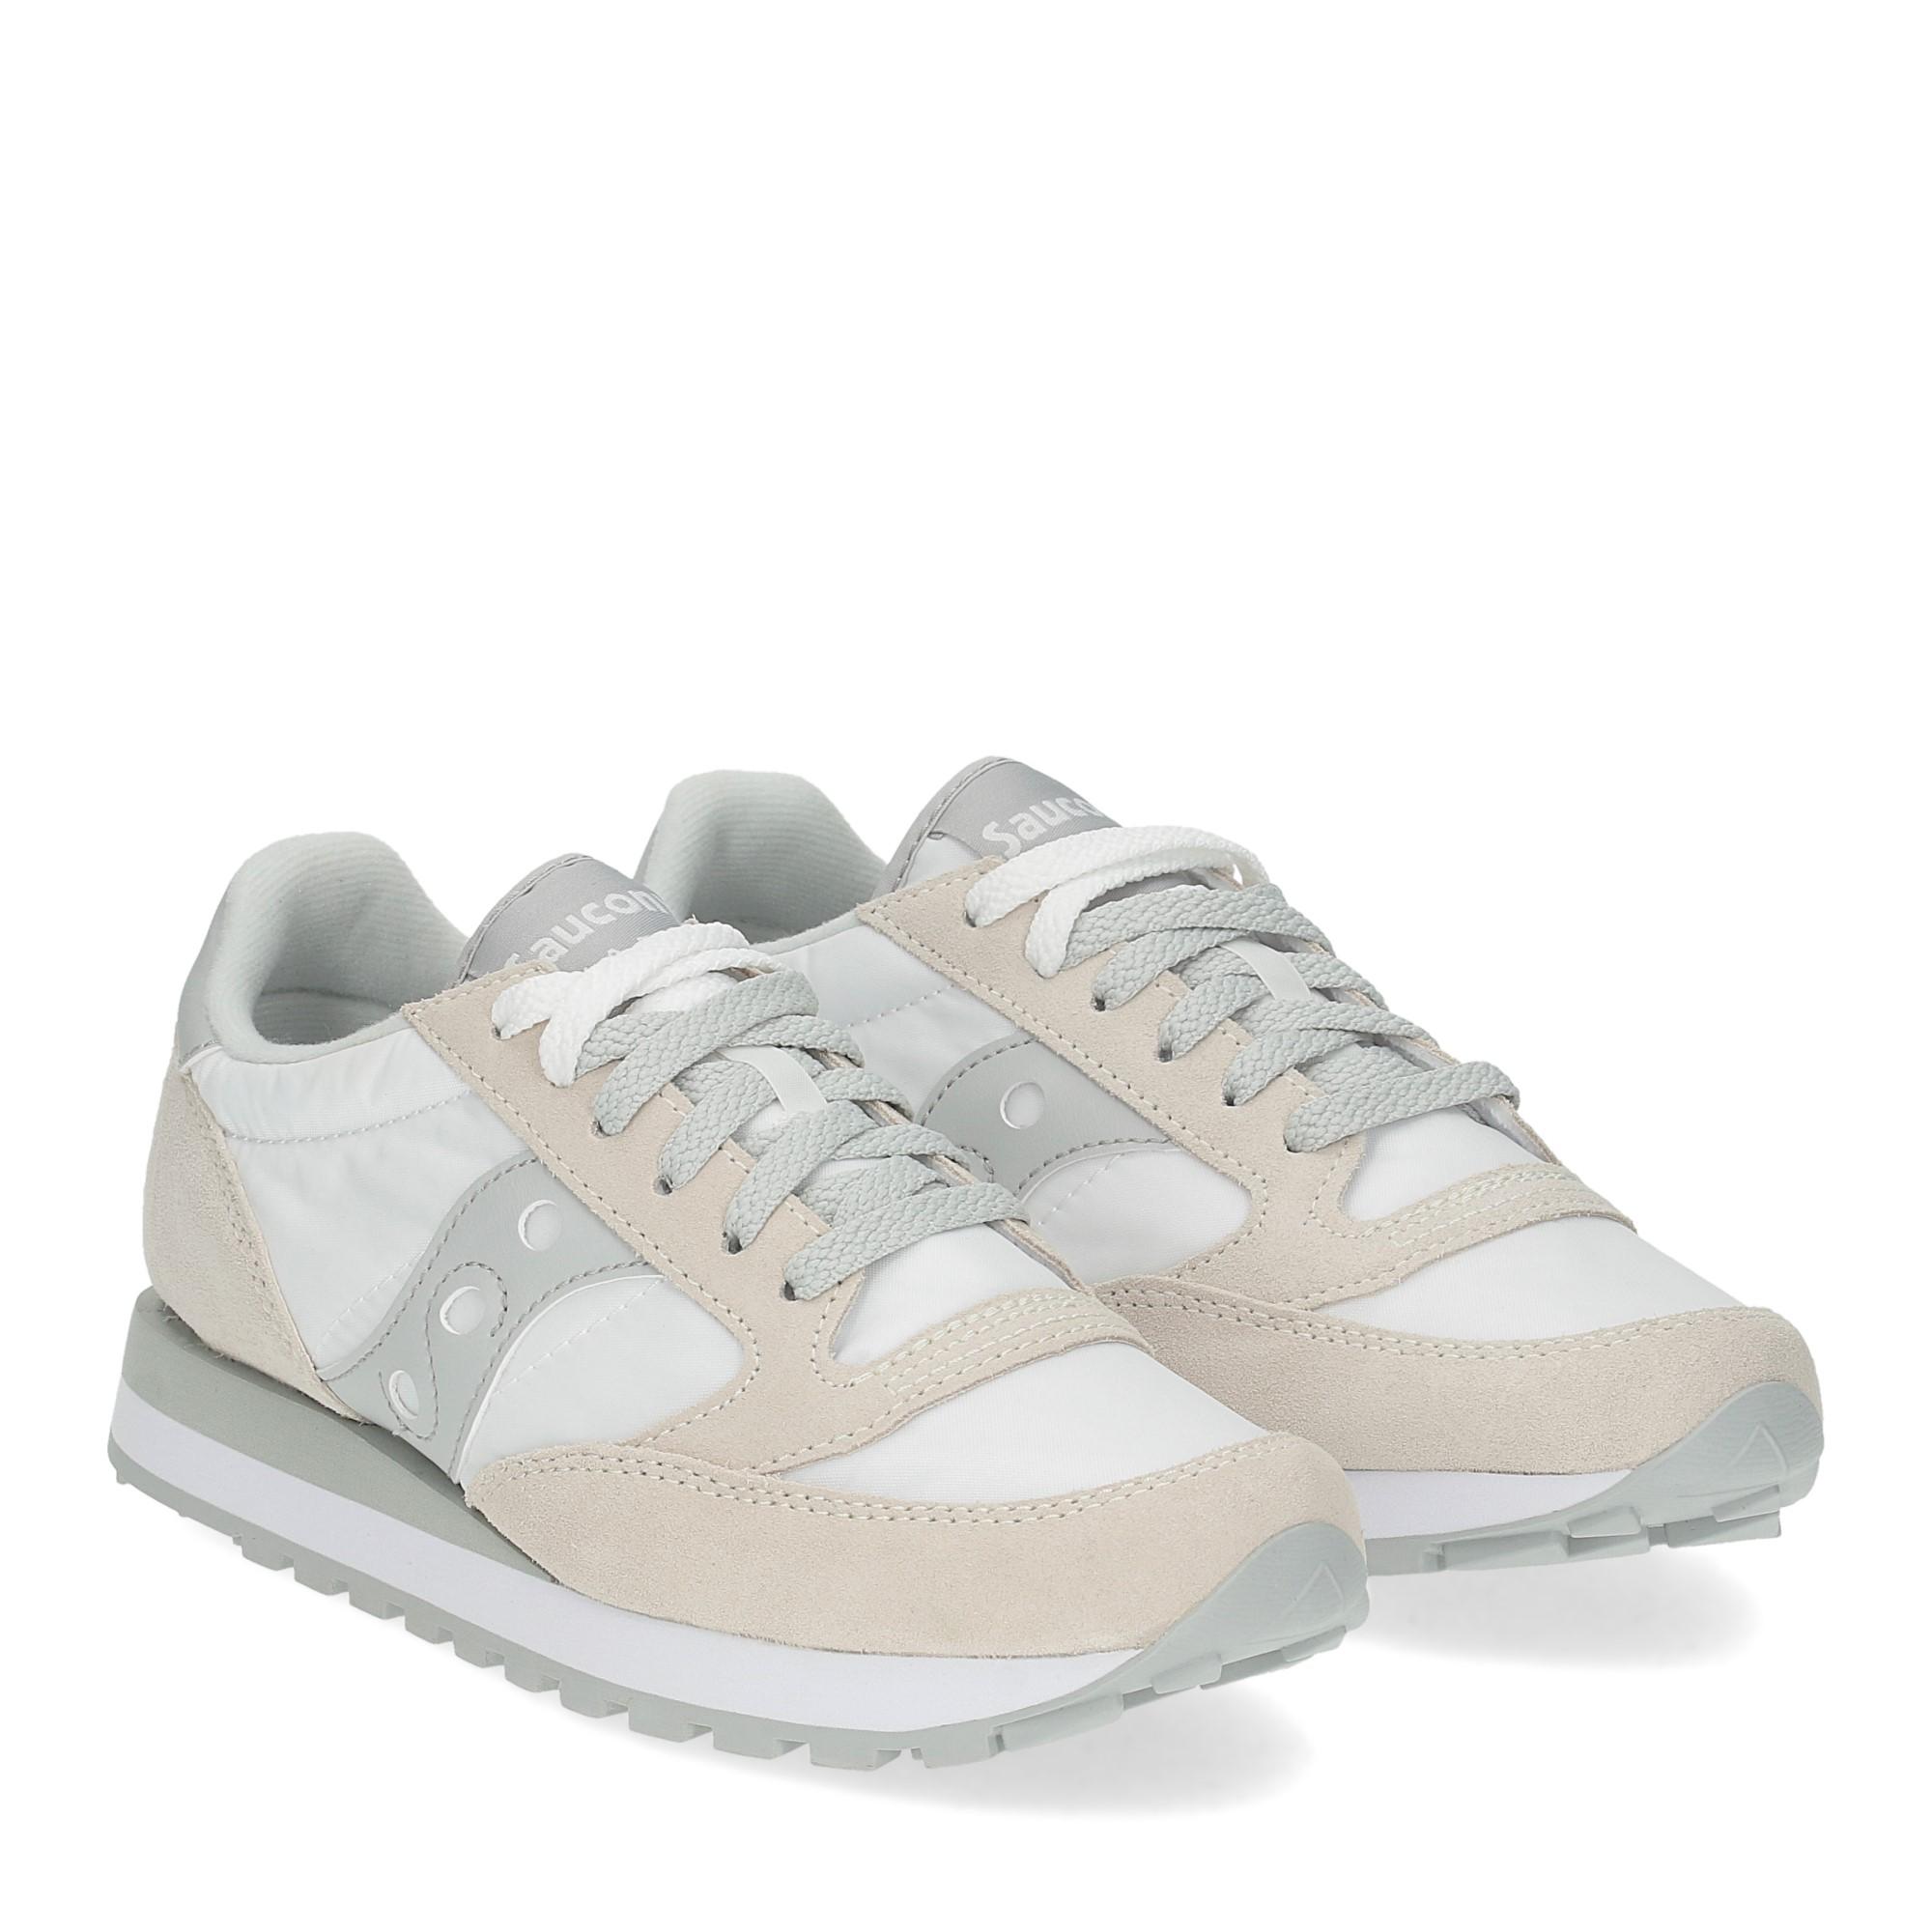 Saucony Jazz Original white grey